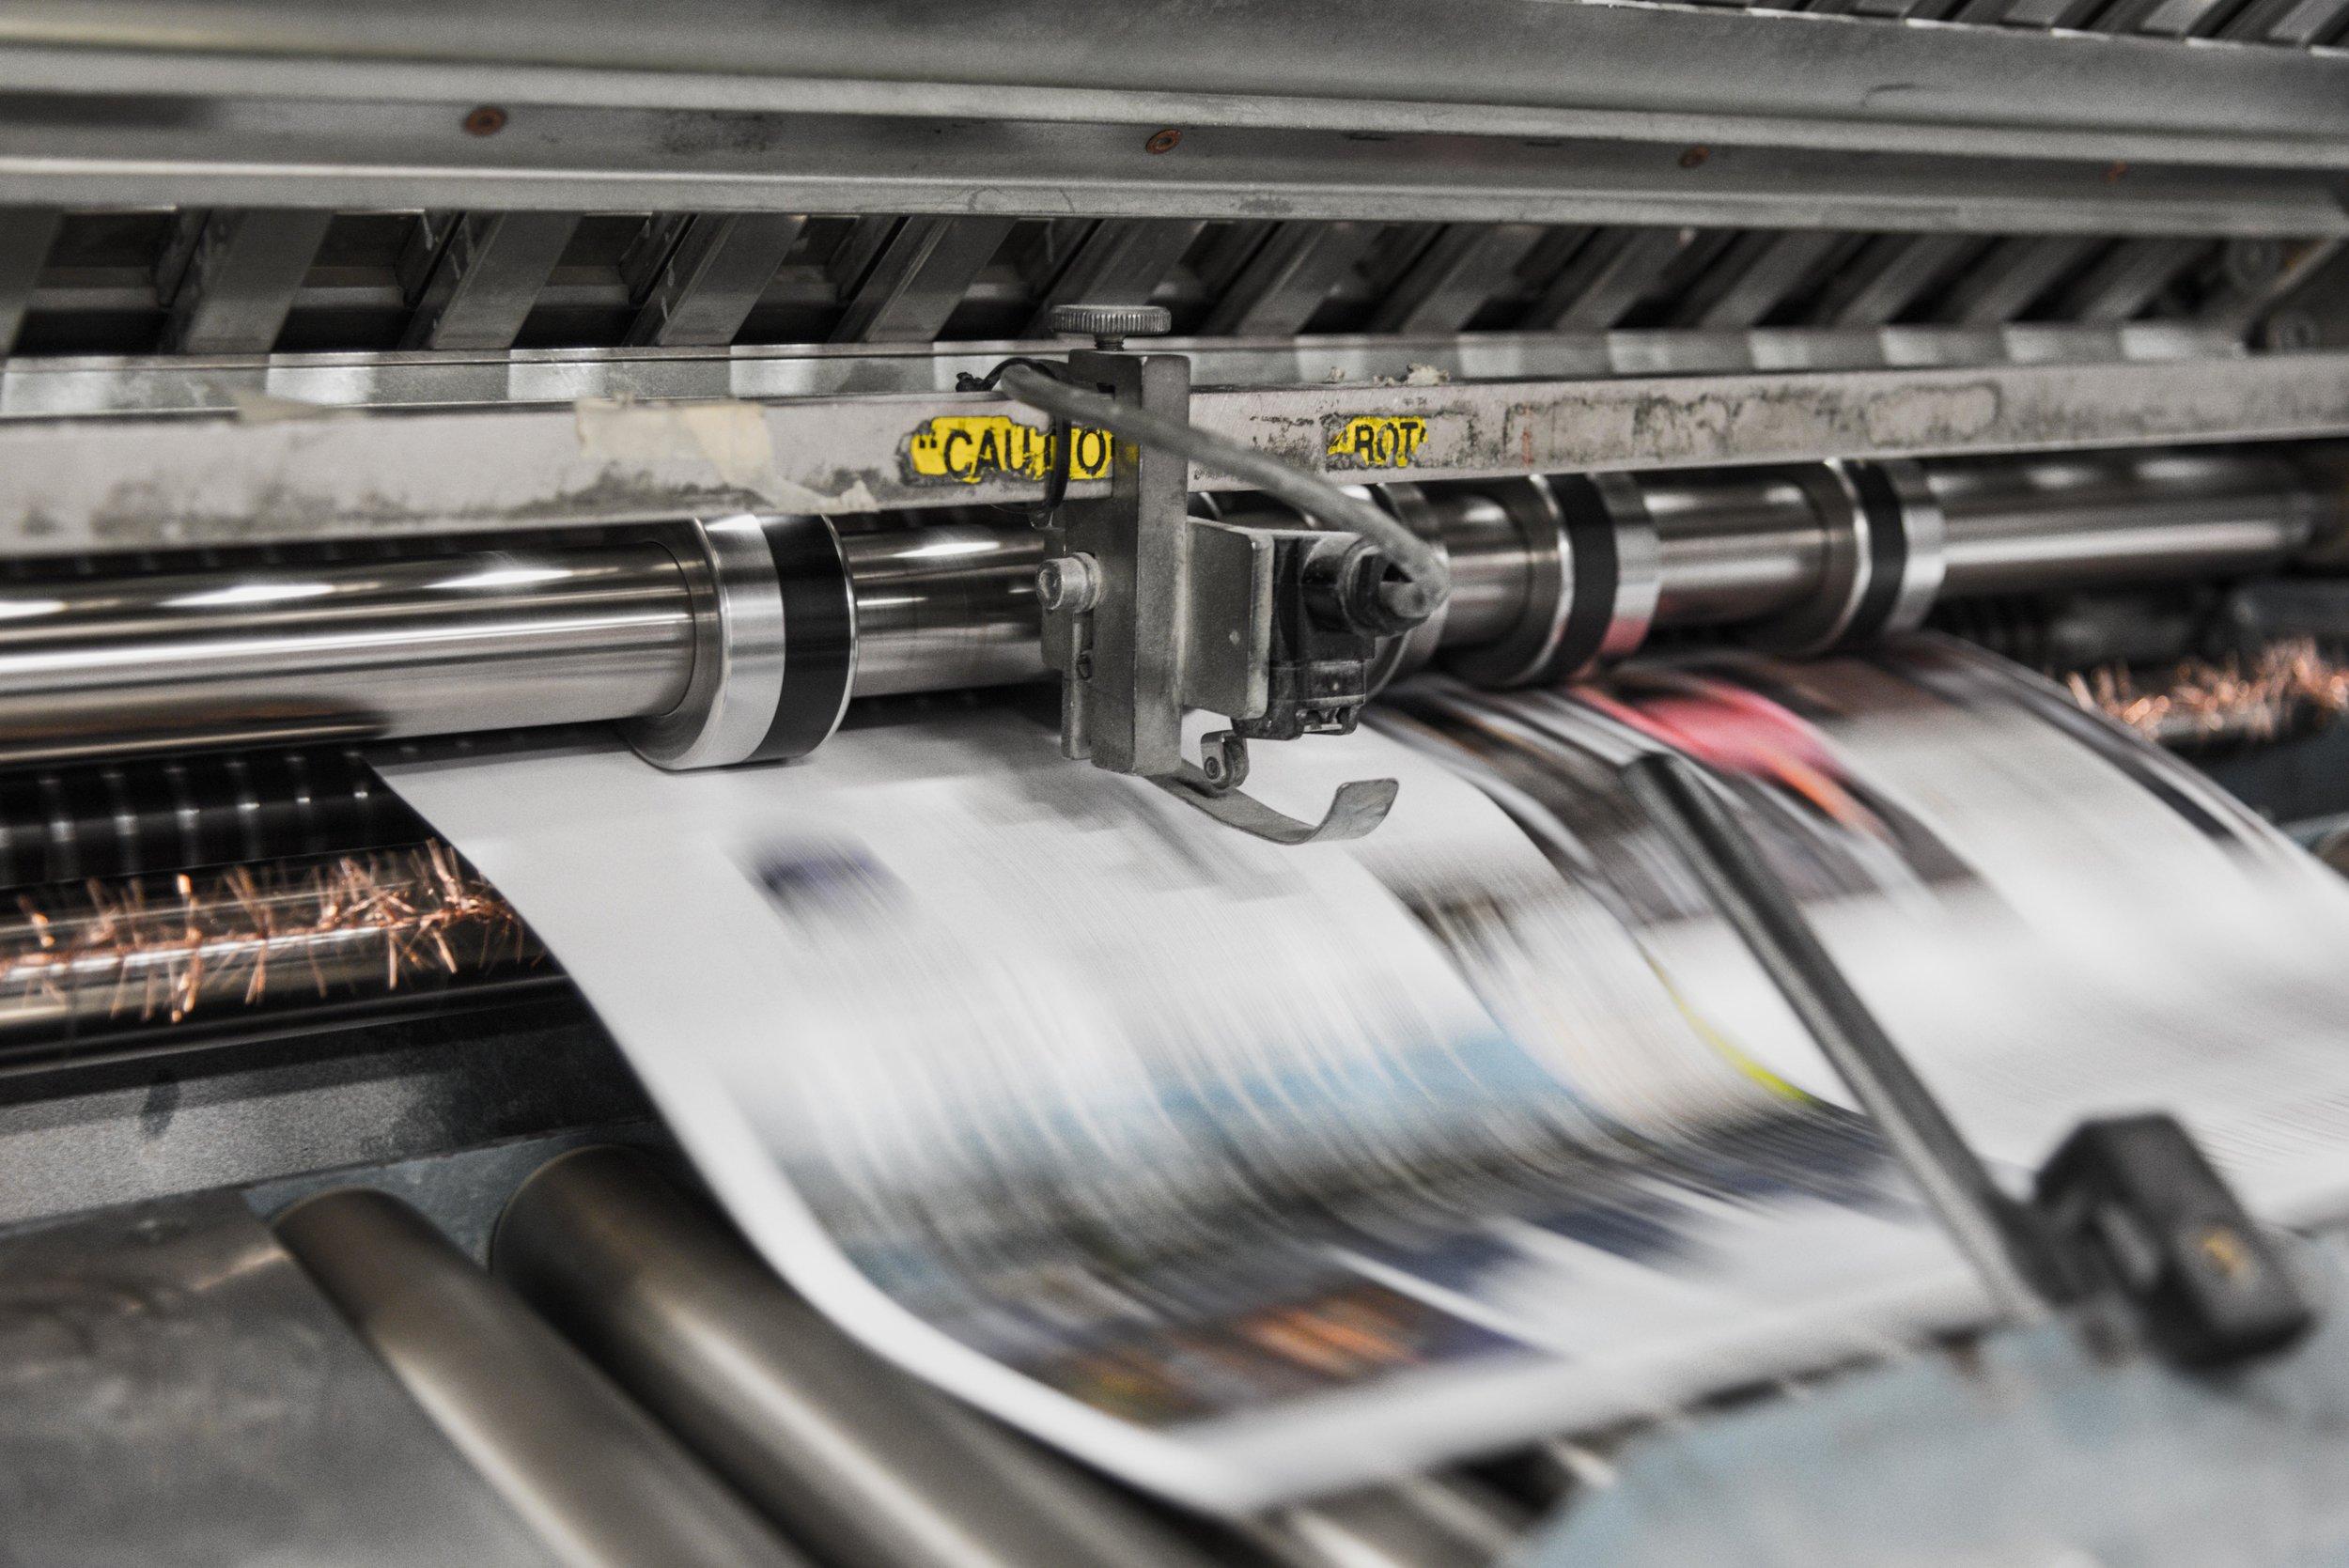 Print Medien - Aufkleber, Poster, Banner, Flyer, Becher, Buttons, Visitenkarten, Aufkleber, Poster, Banner, Flyer, Becher, Buttons, Visitenkarten u.vm.